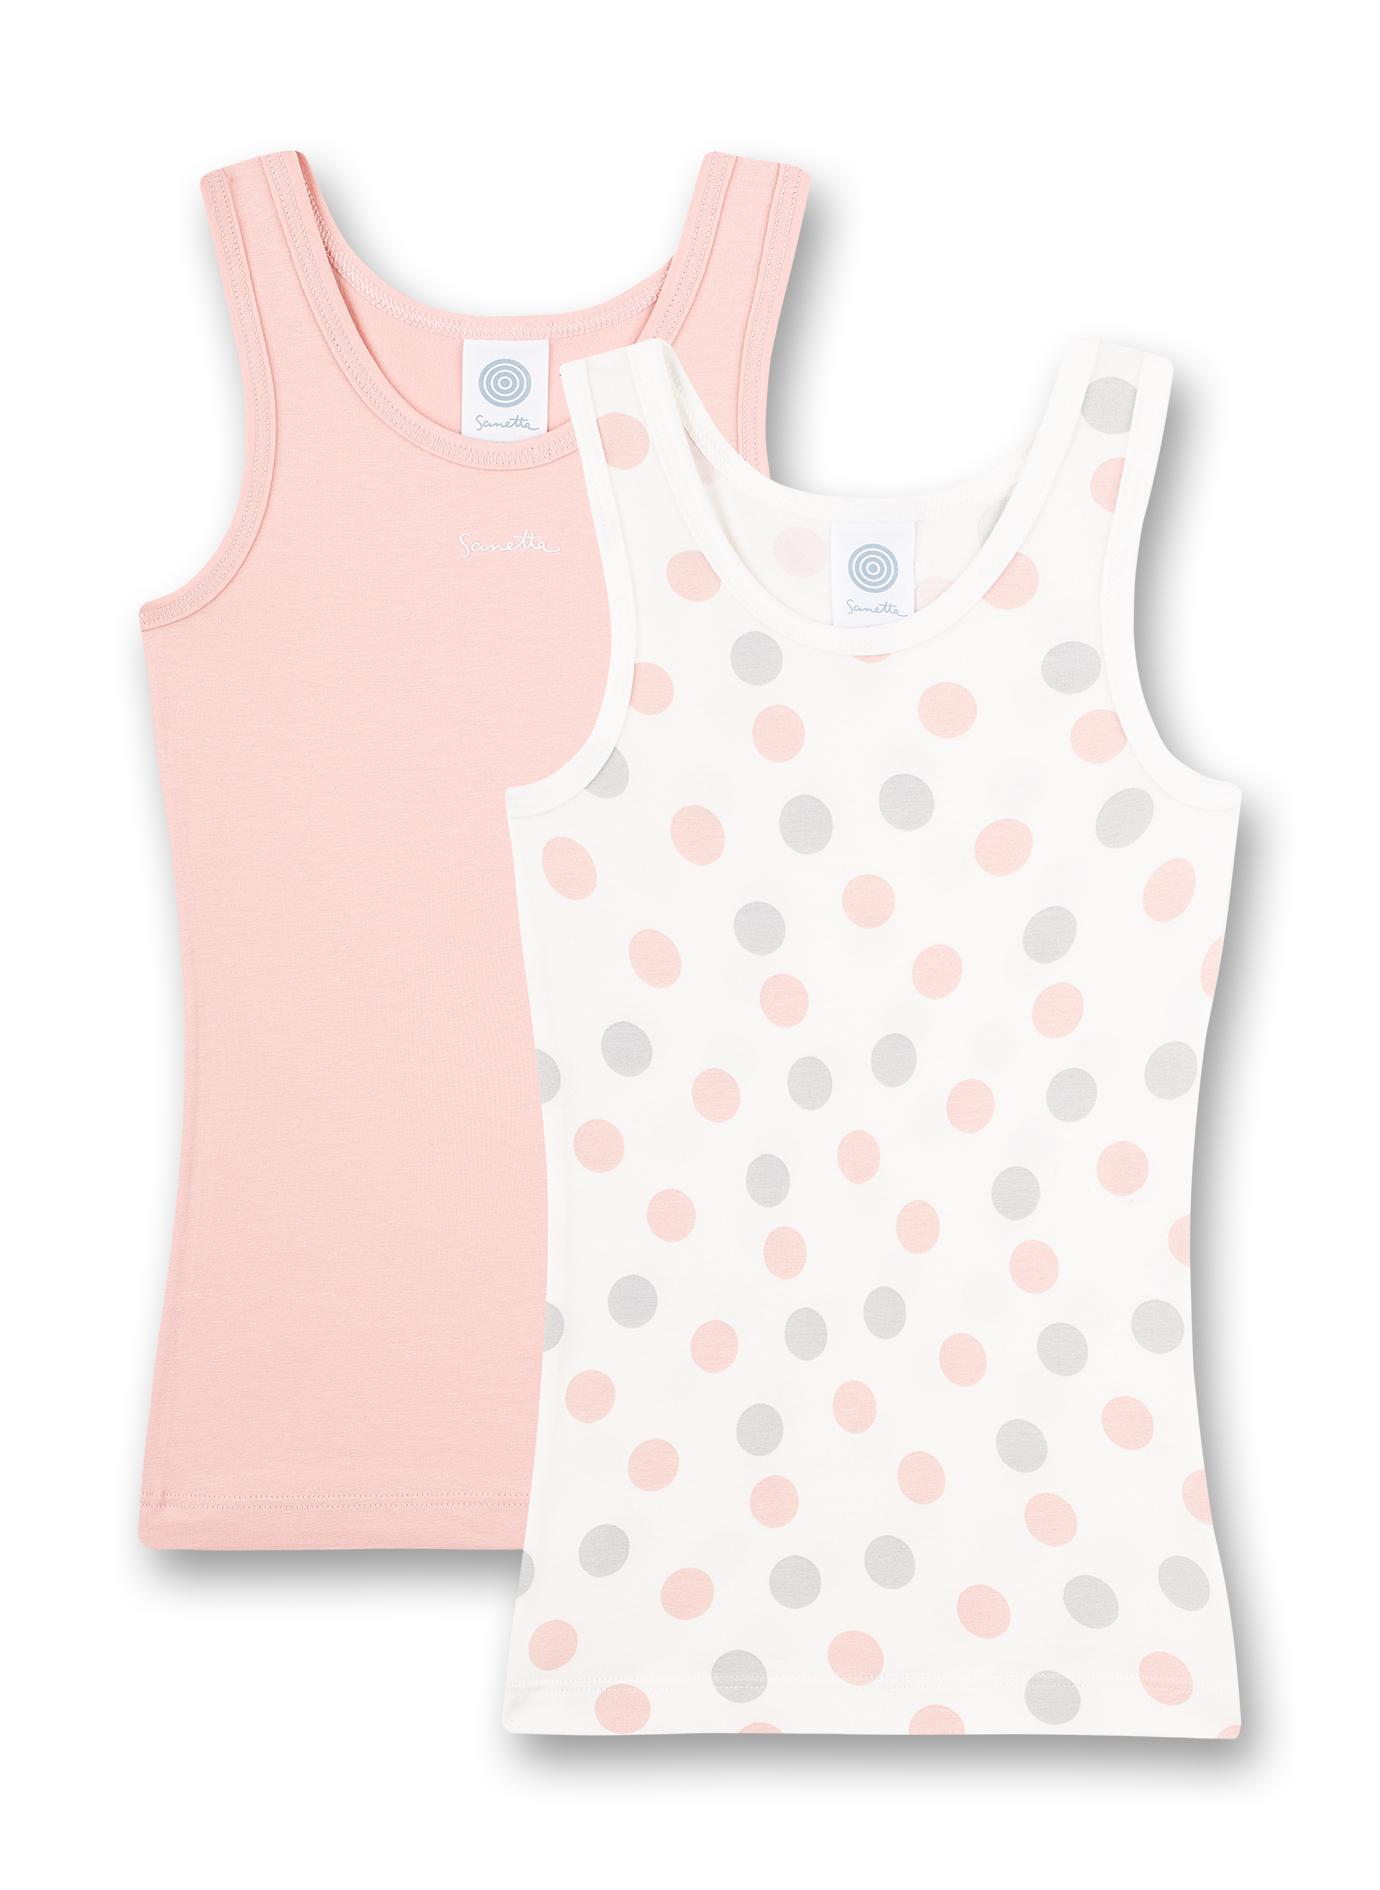 Doppelpack Shirt 116 white pe Sanetta